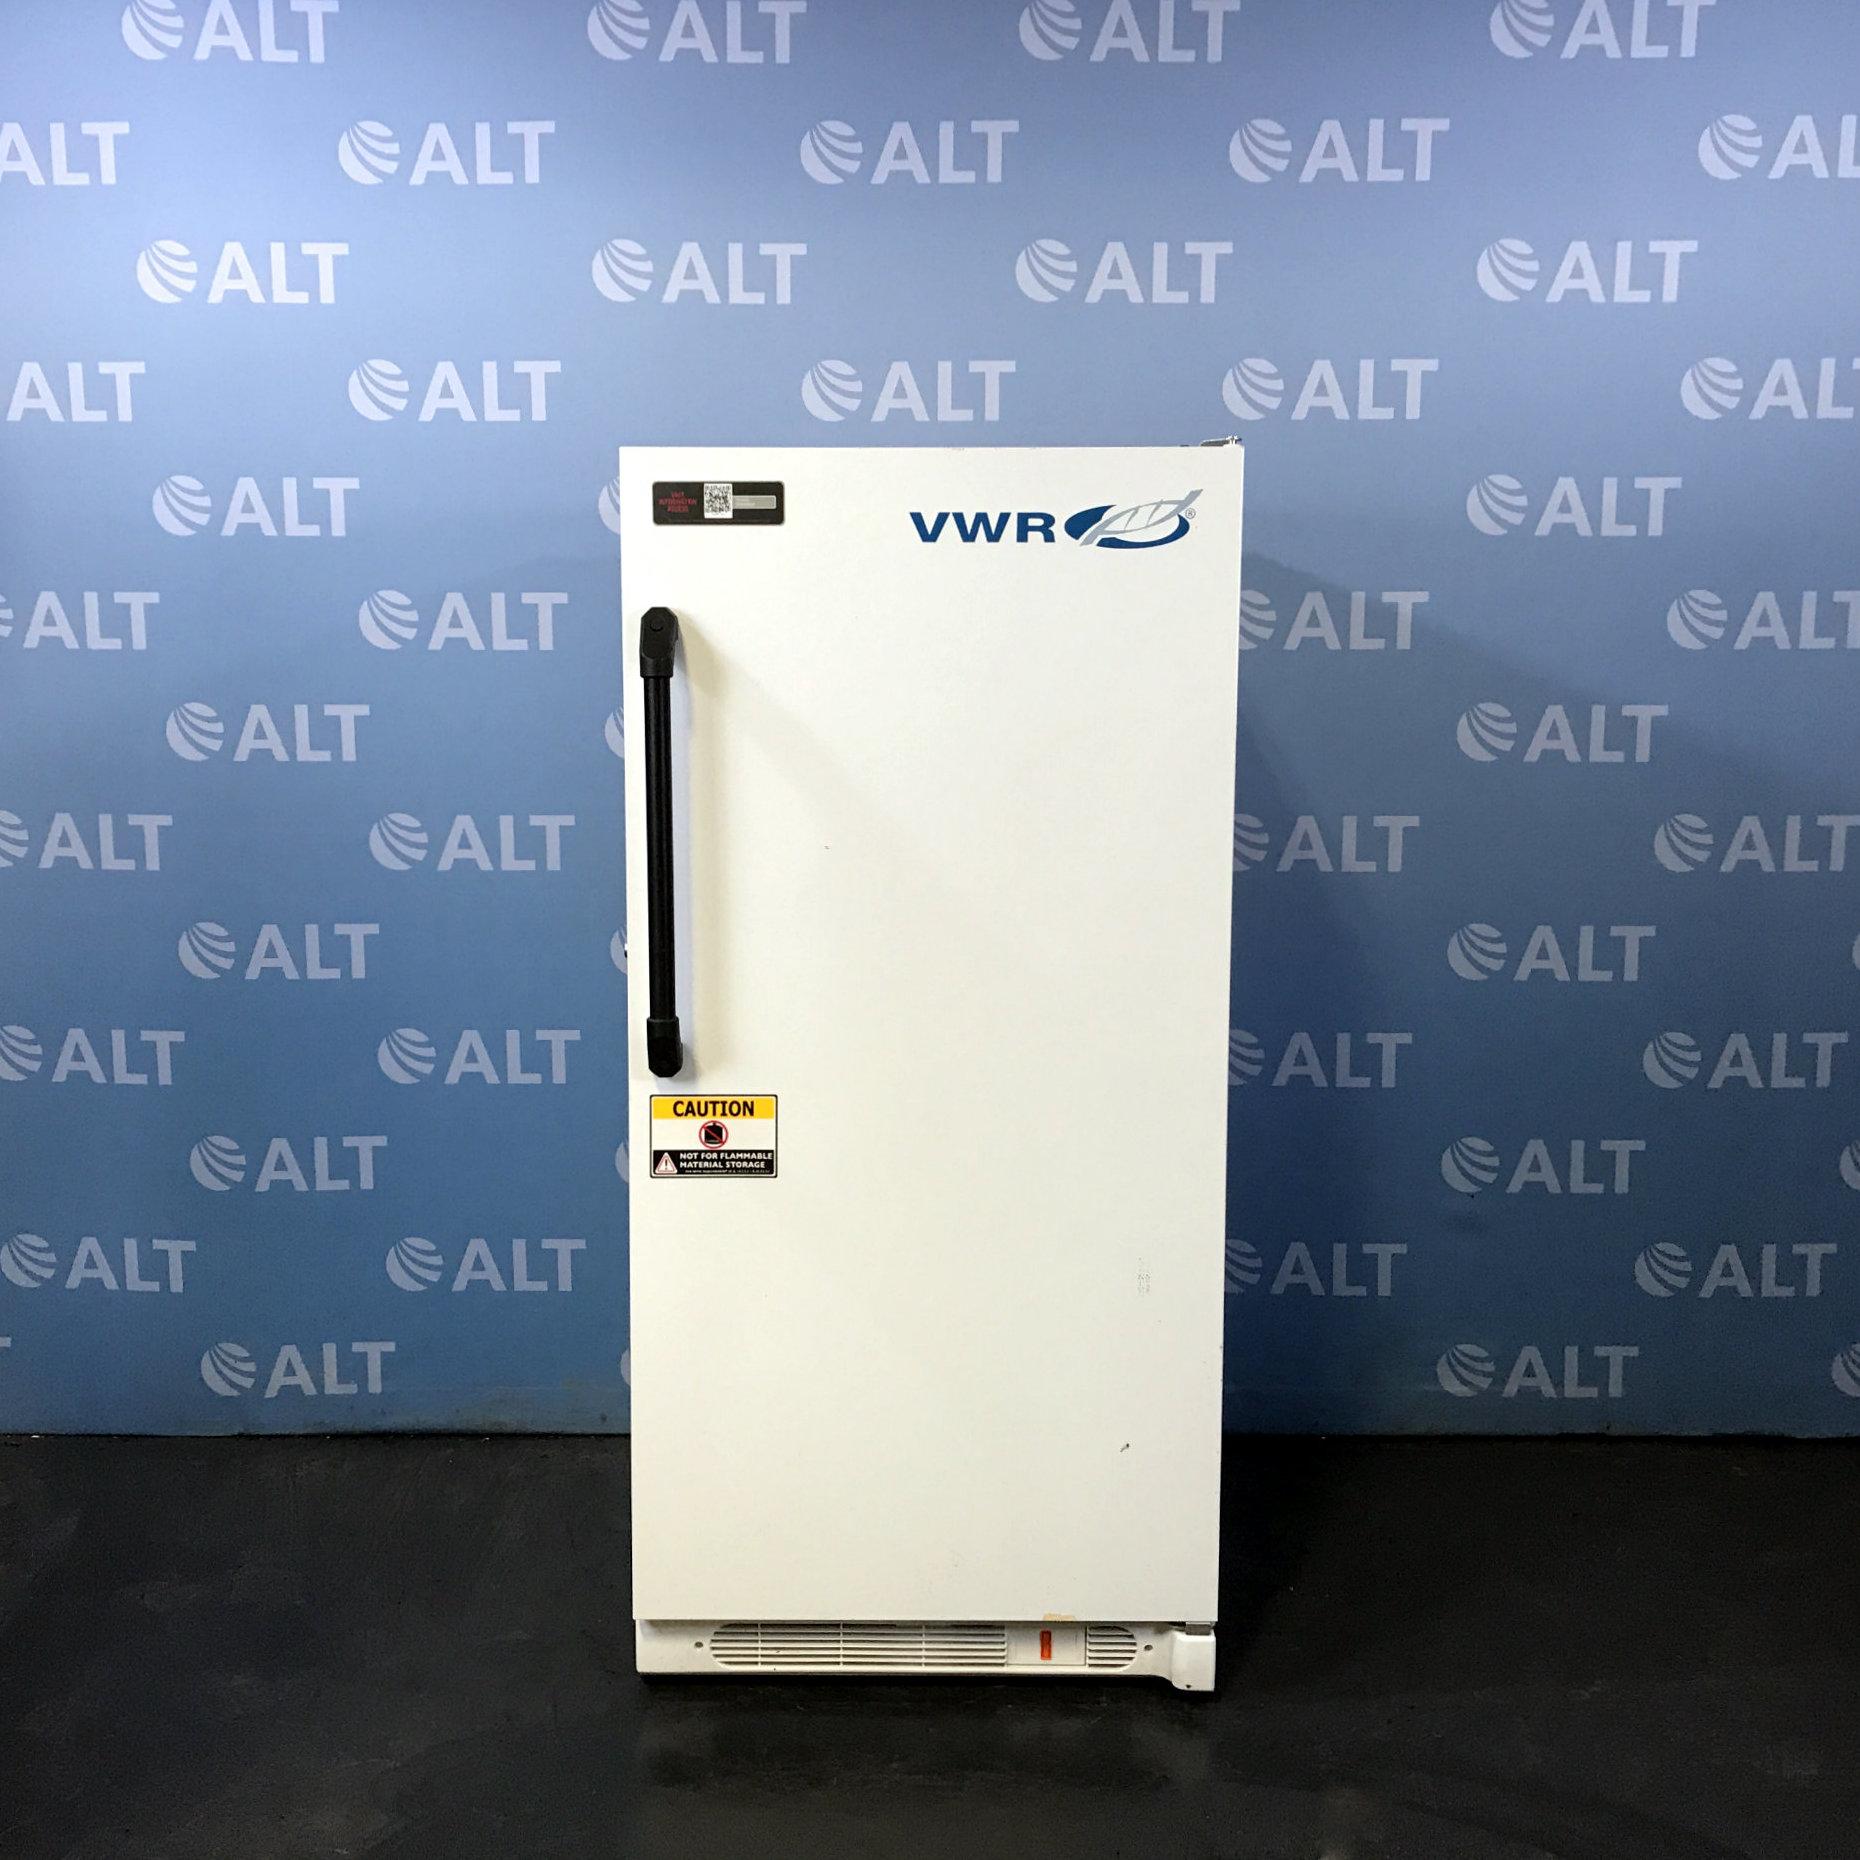 VWR SCBMF-1420 -20 Freezer Image